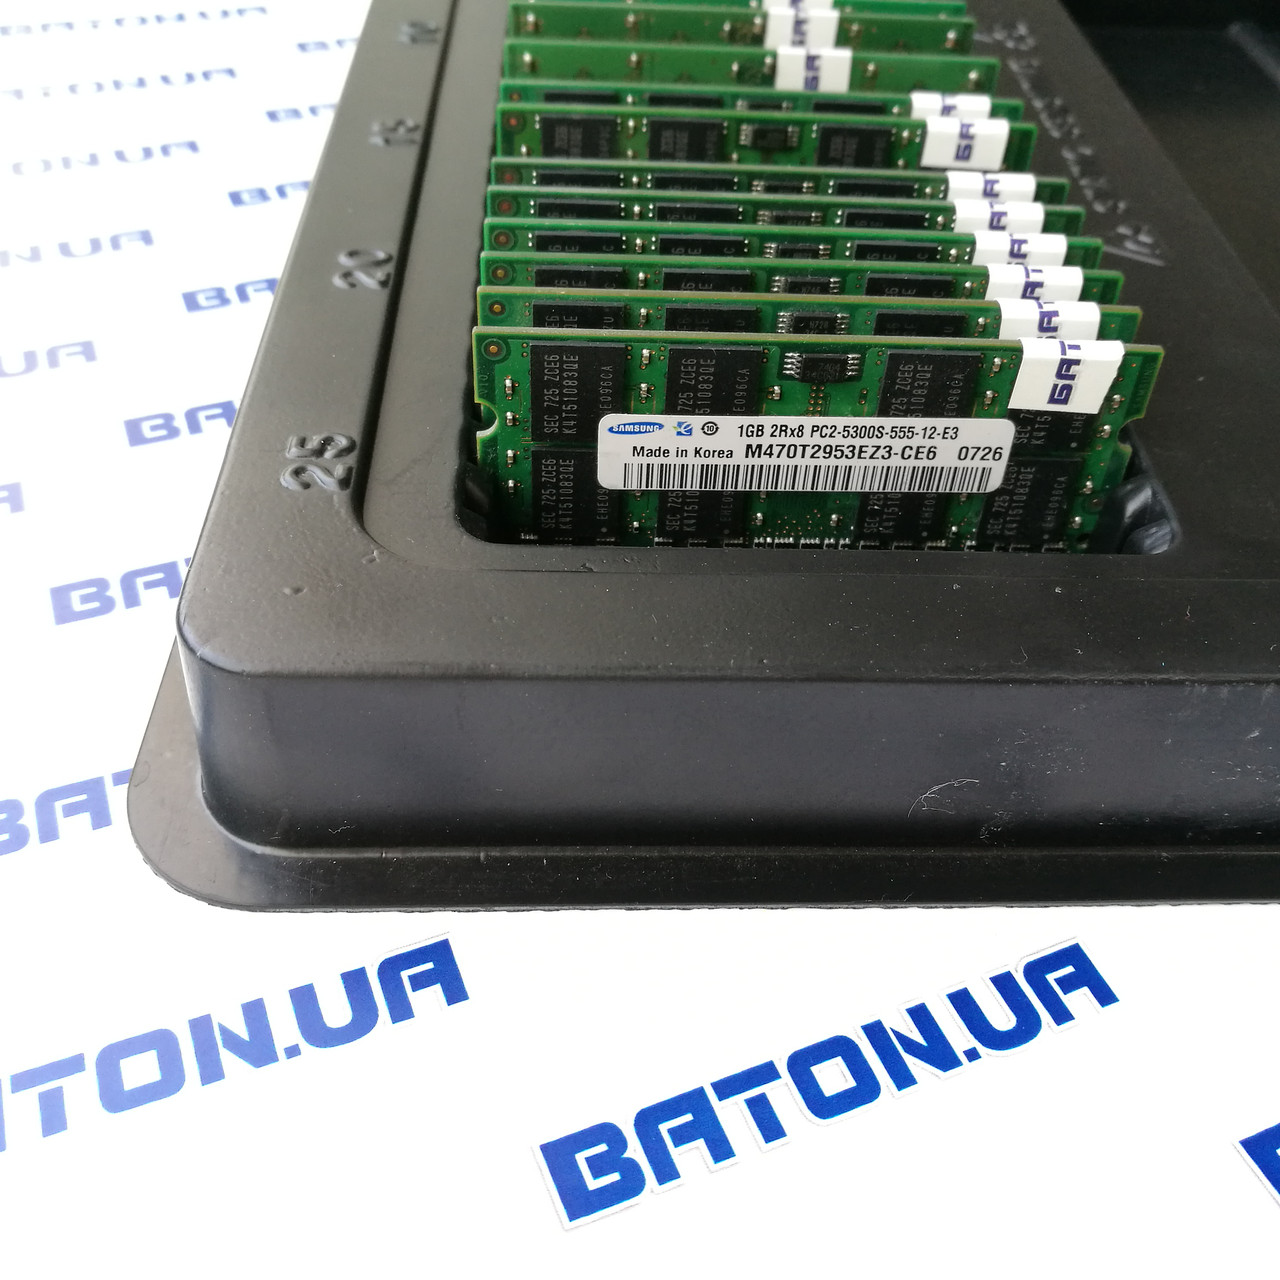 Оперативная память Samsung SODIMM DDR2 1Gb 667MHz 5300s CL5 (M470T2864QZ3-CE6)